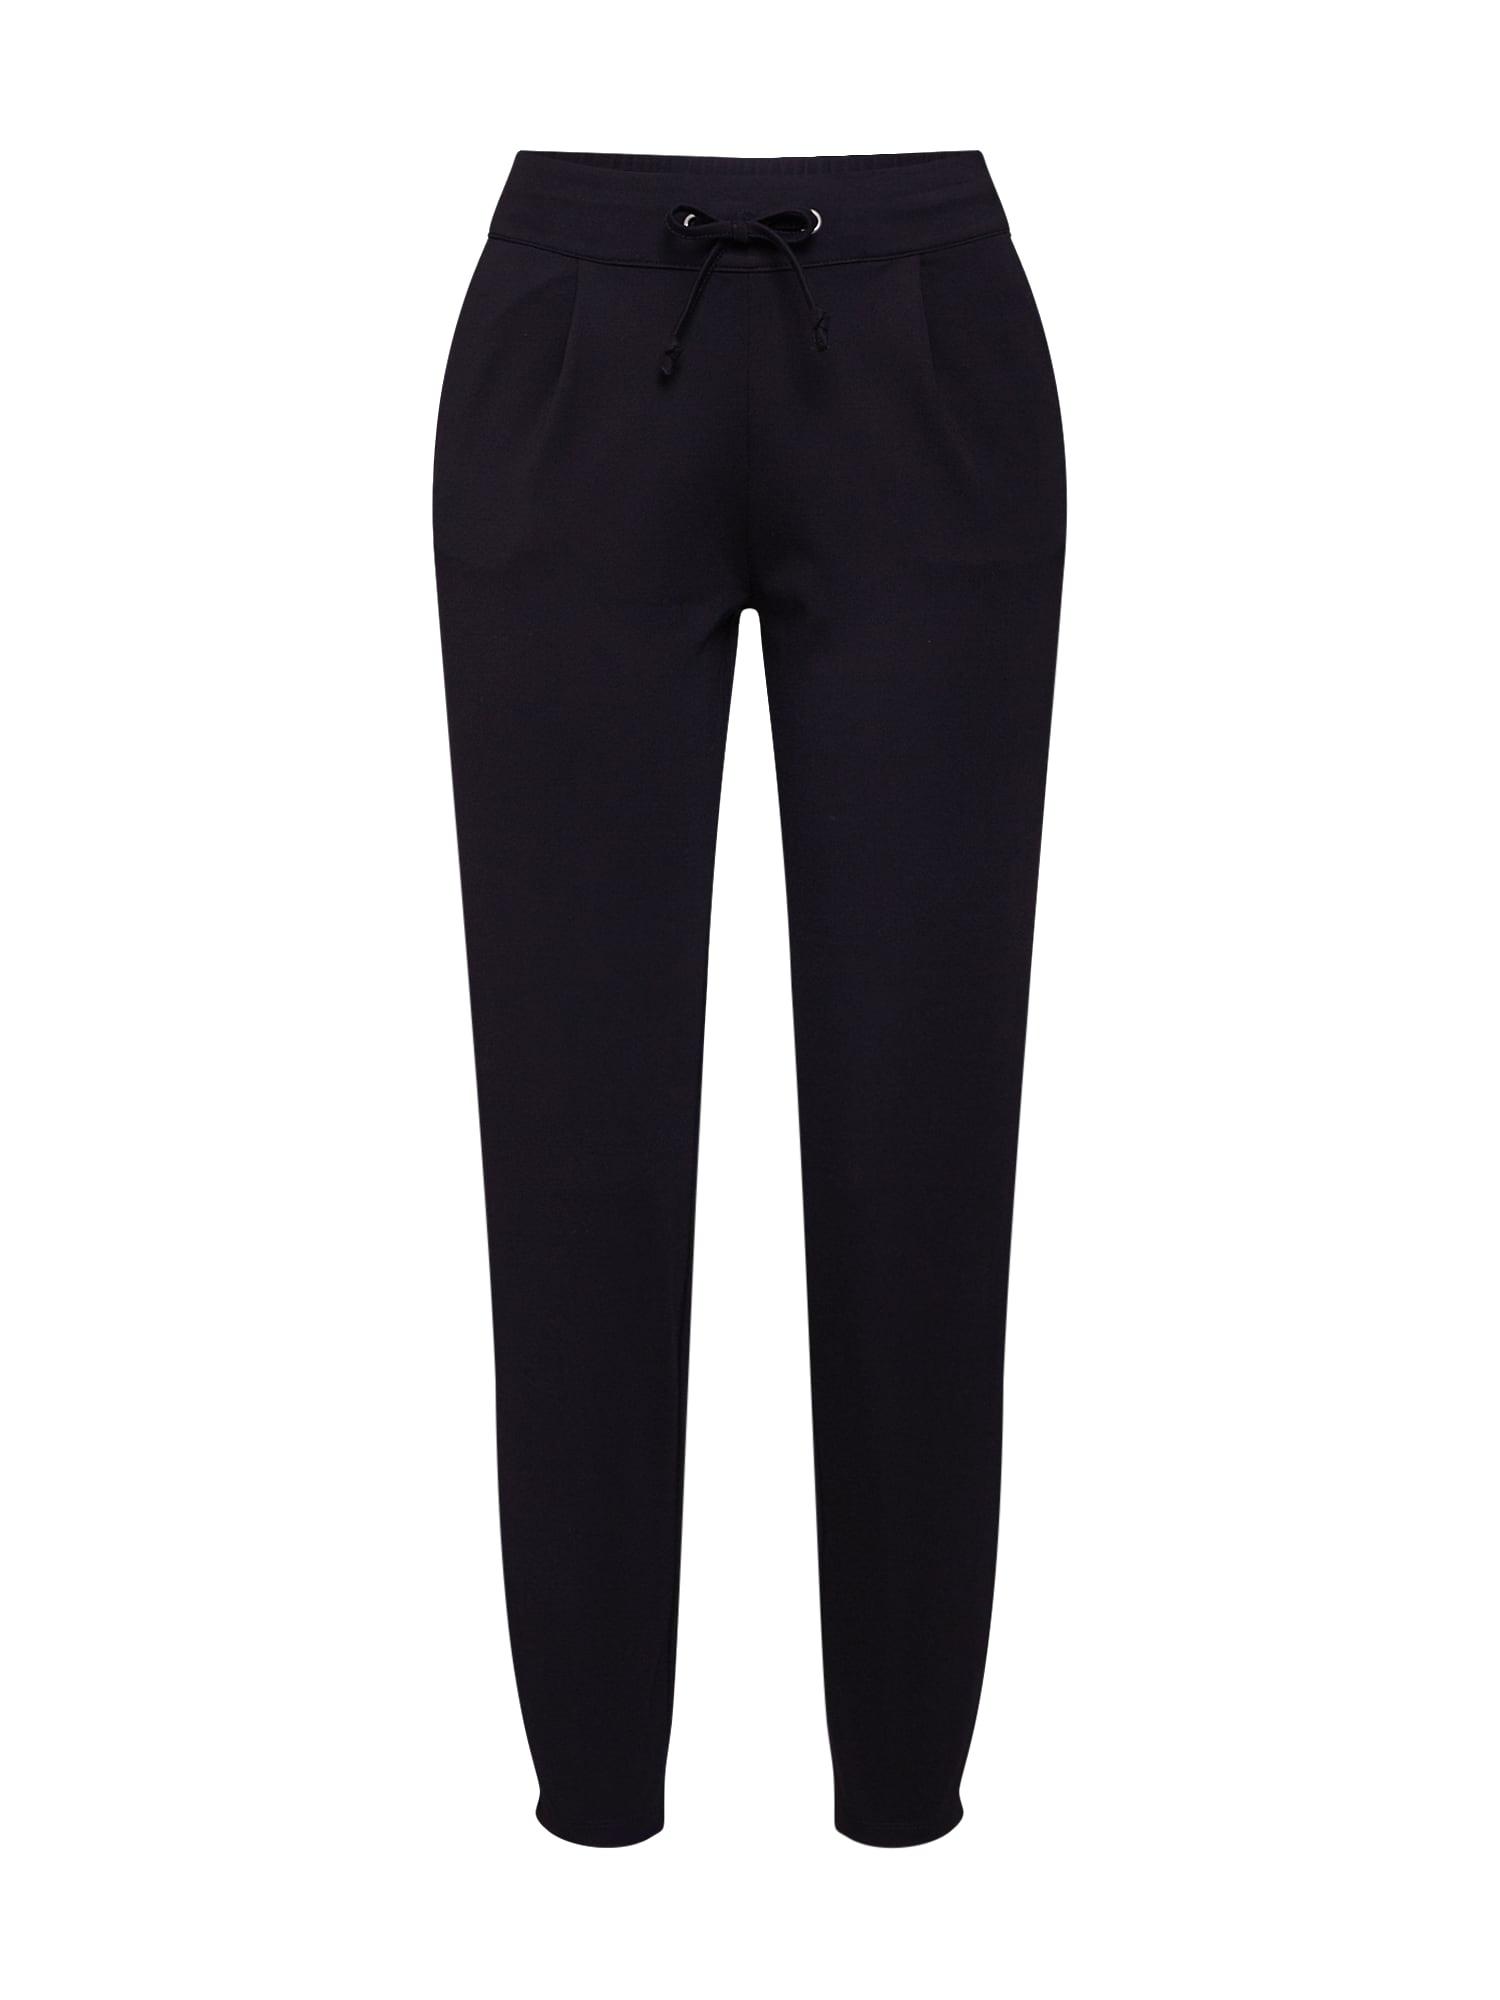 JACQUELINE de YONG Klostuotos kelnės 'Pretty' juoda